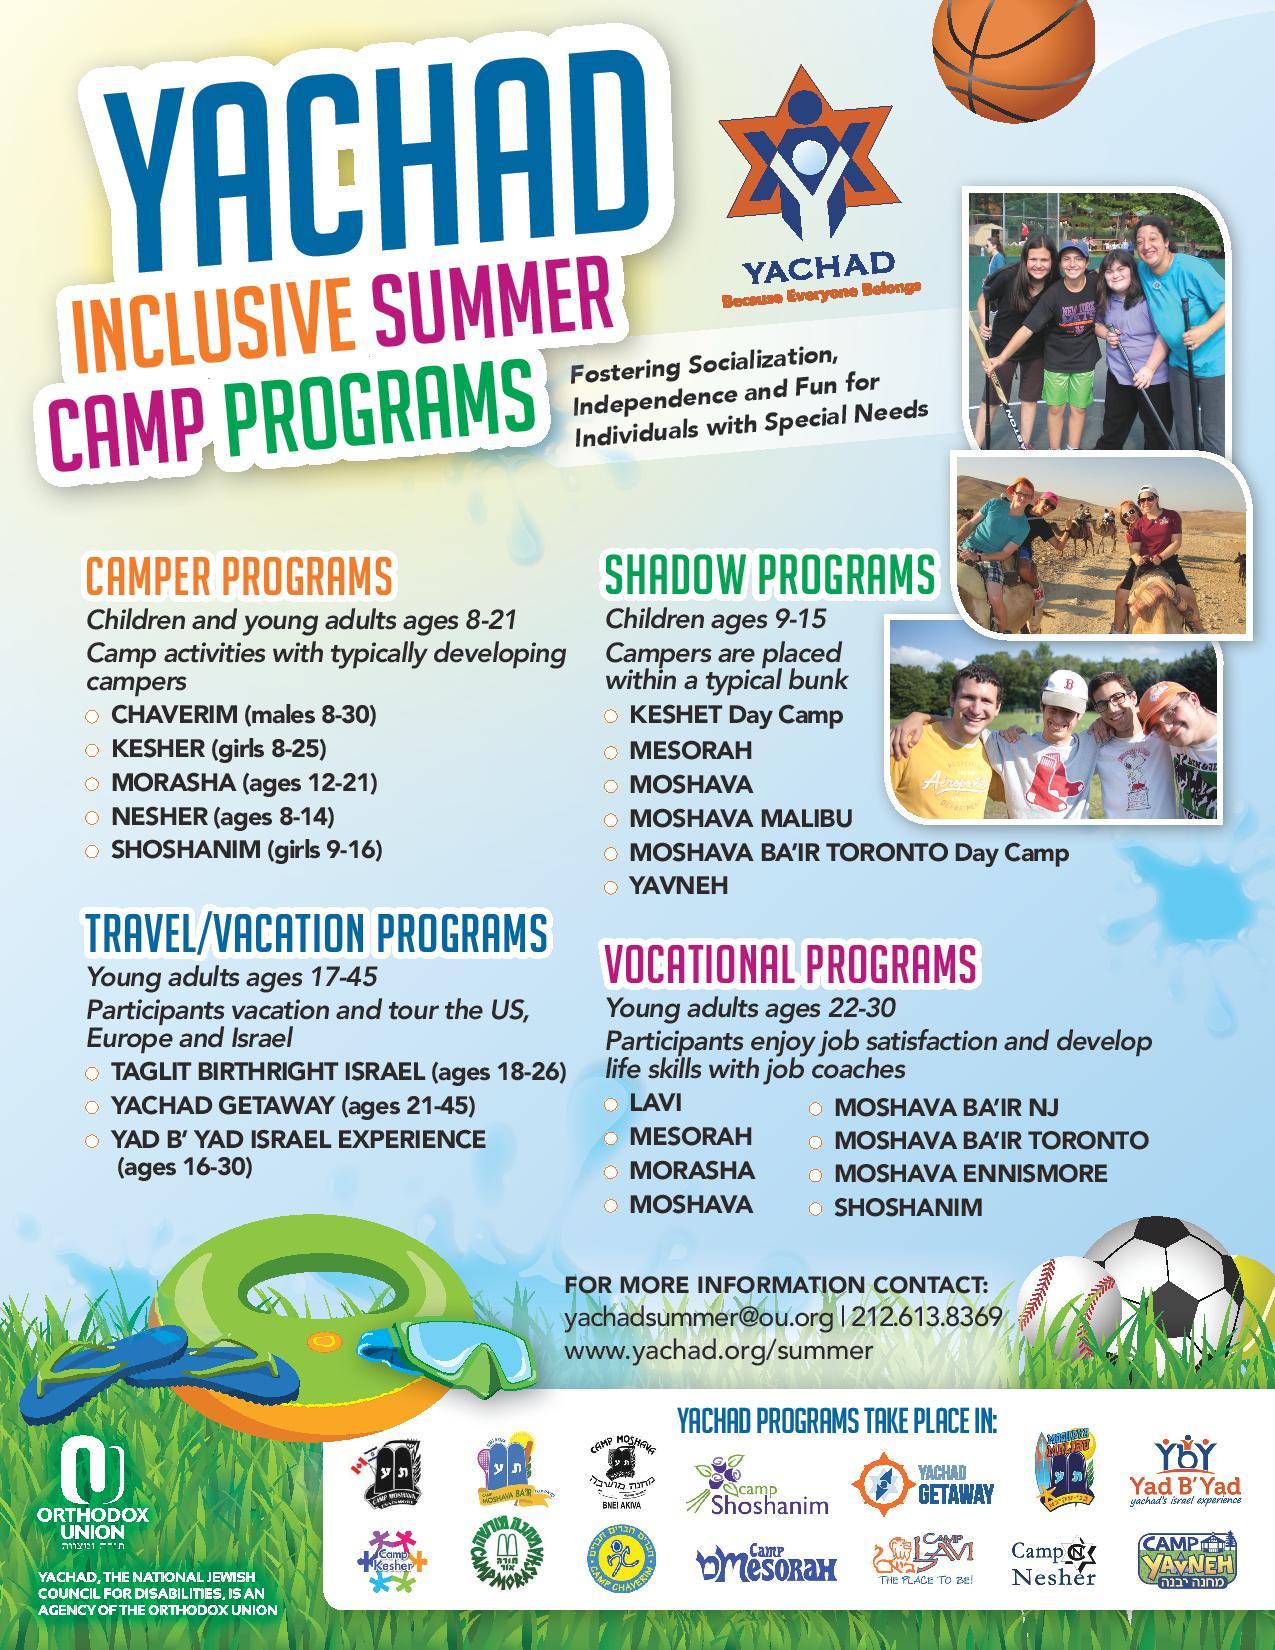 Yachad Inclusive Summer Camp Programs - Yachad - photo#17